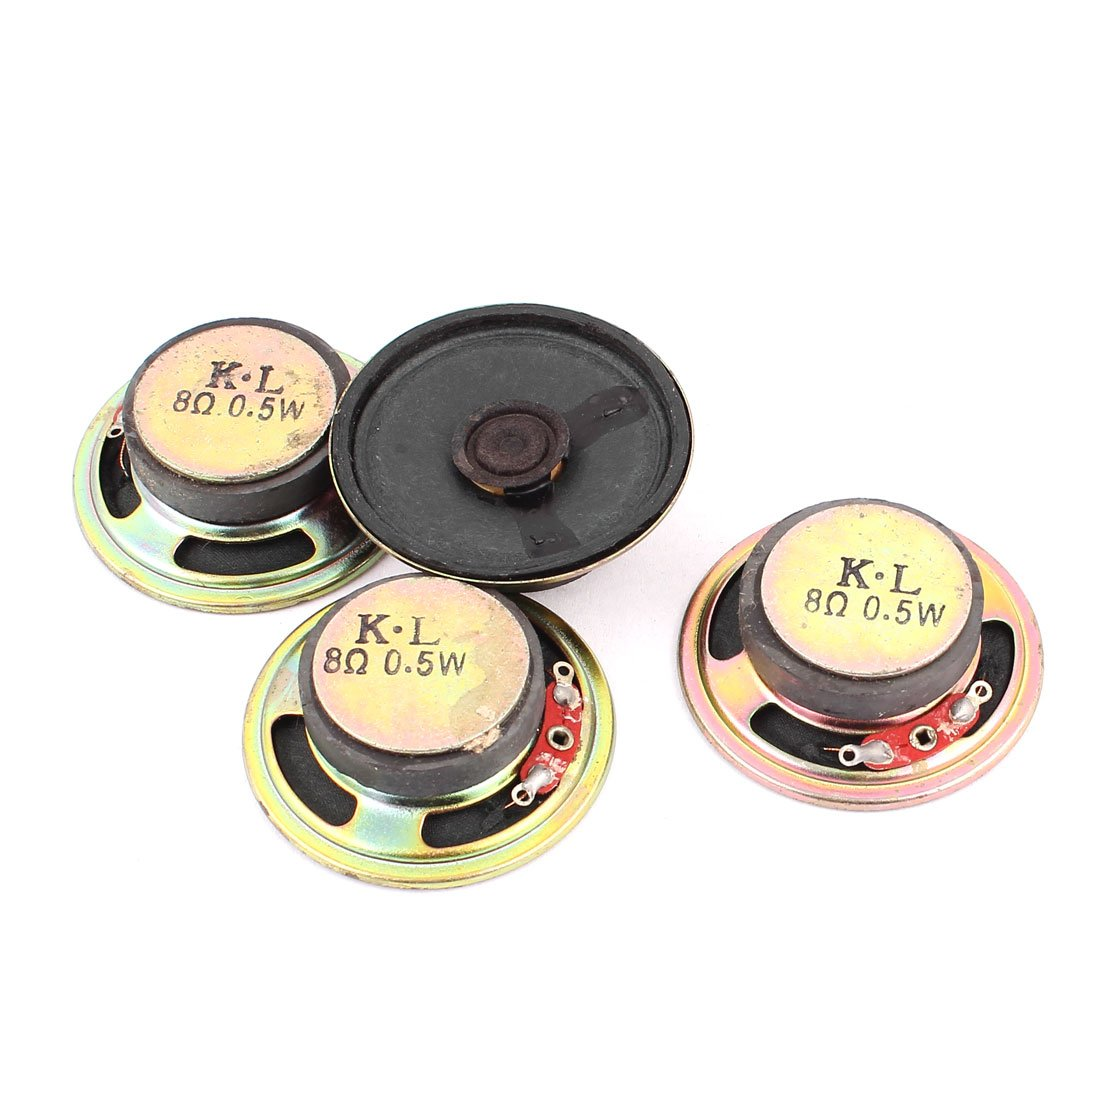 uxcell 0.5W 8 Ohm 50mm Diameter External Magnet Speaker Loudspeaker 4Pcs